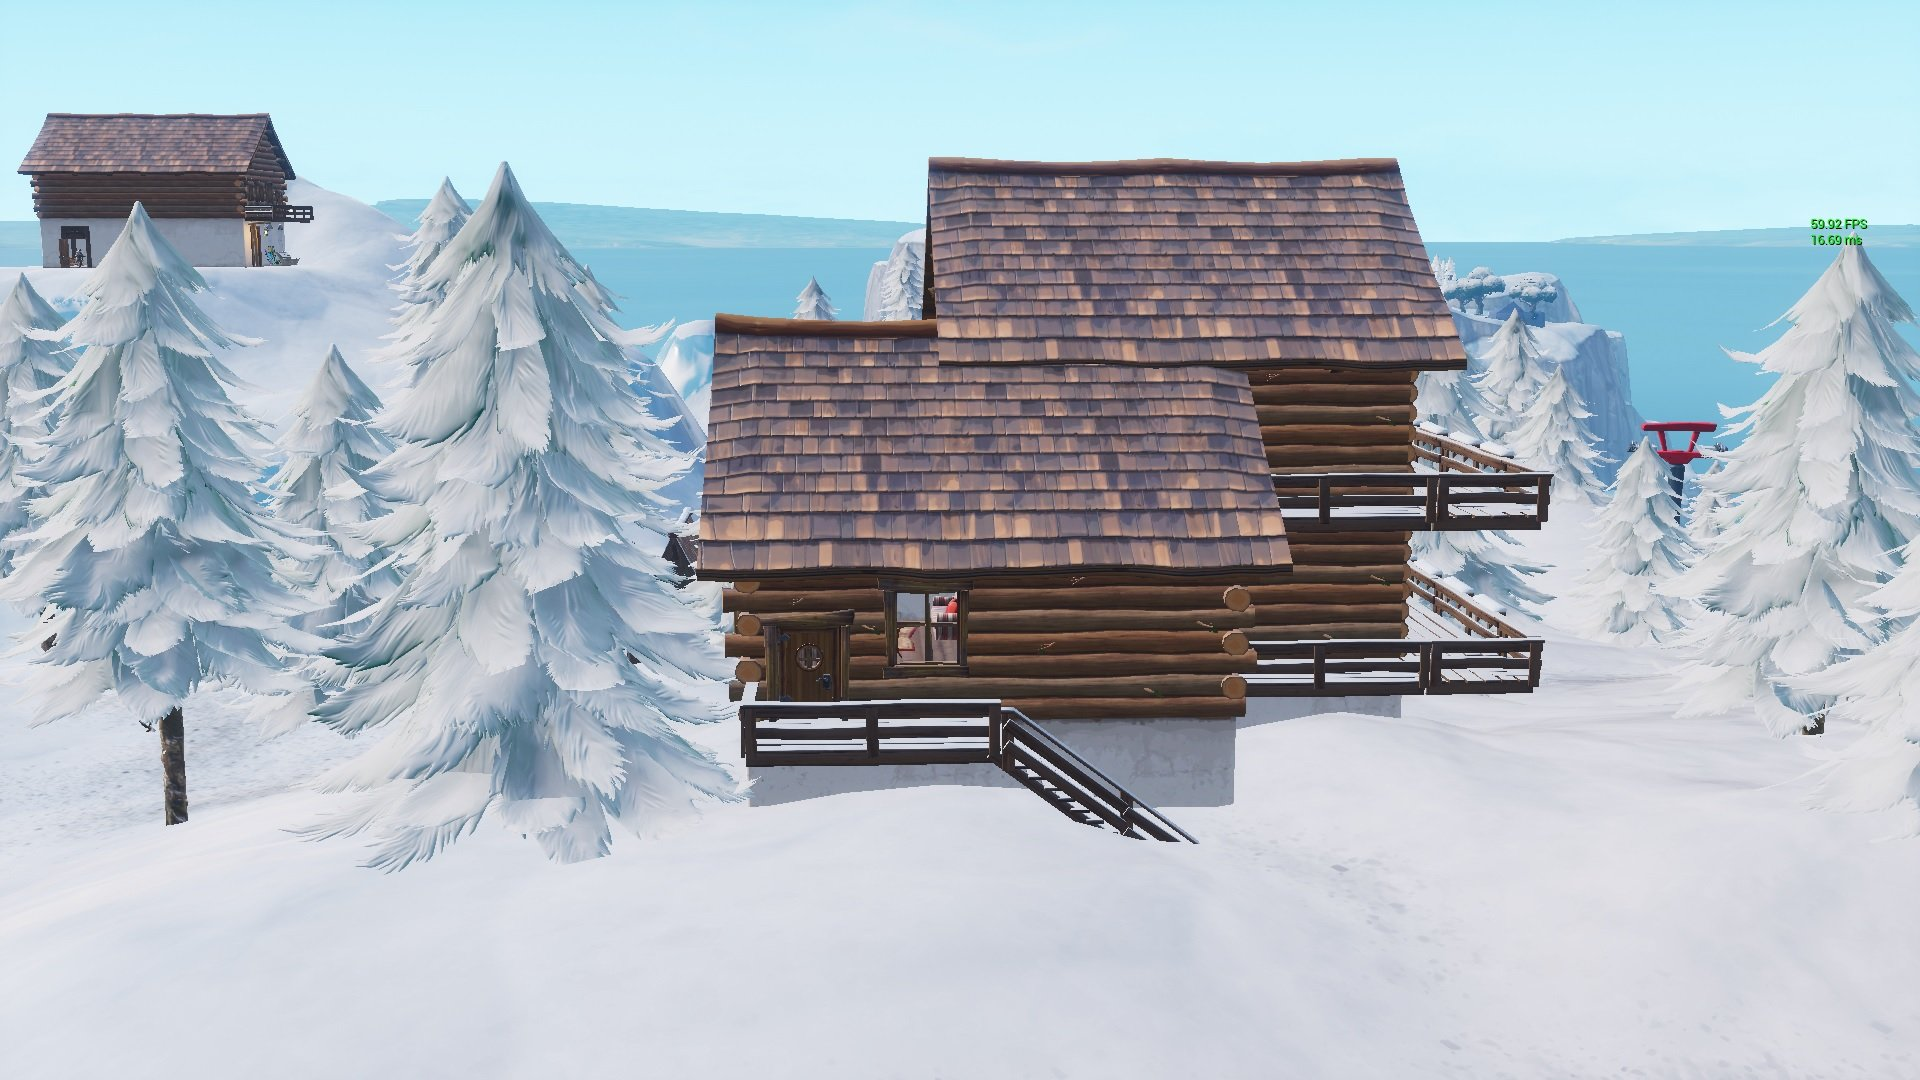 guide modojo shacknews - where are the ski lodges in fortnite season seven